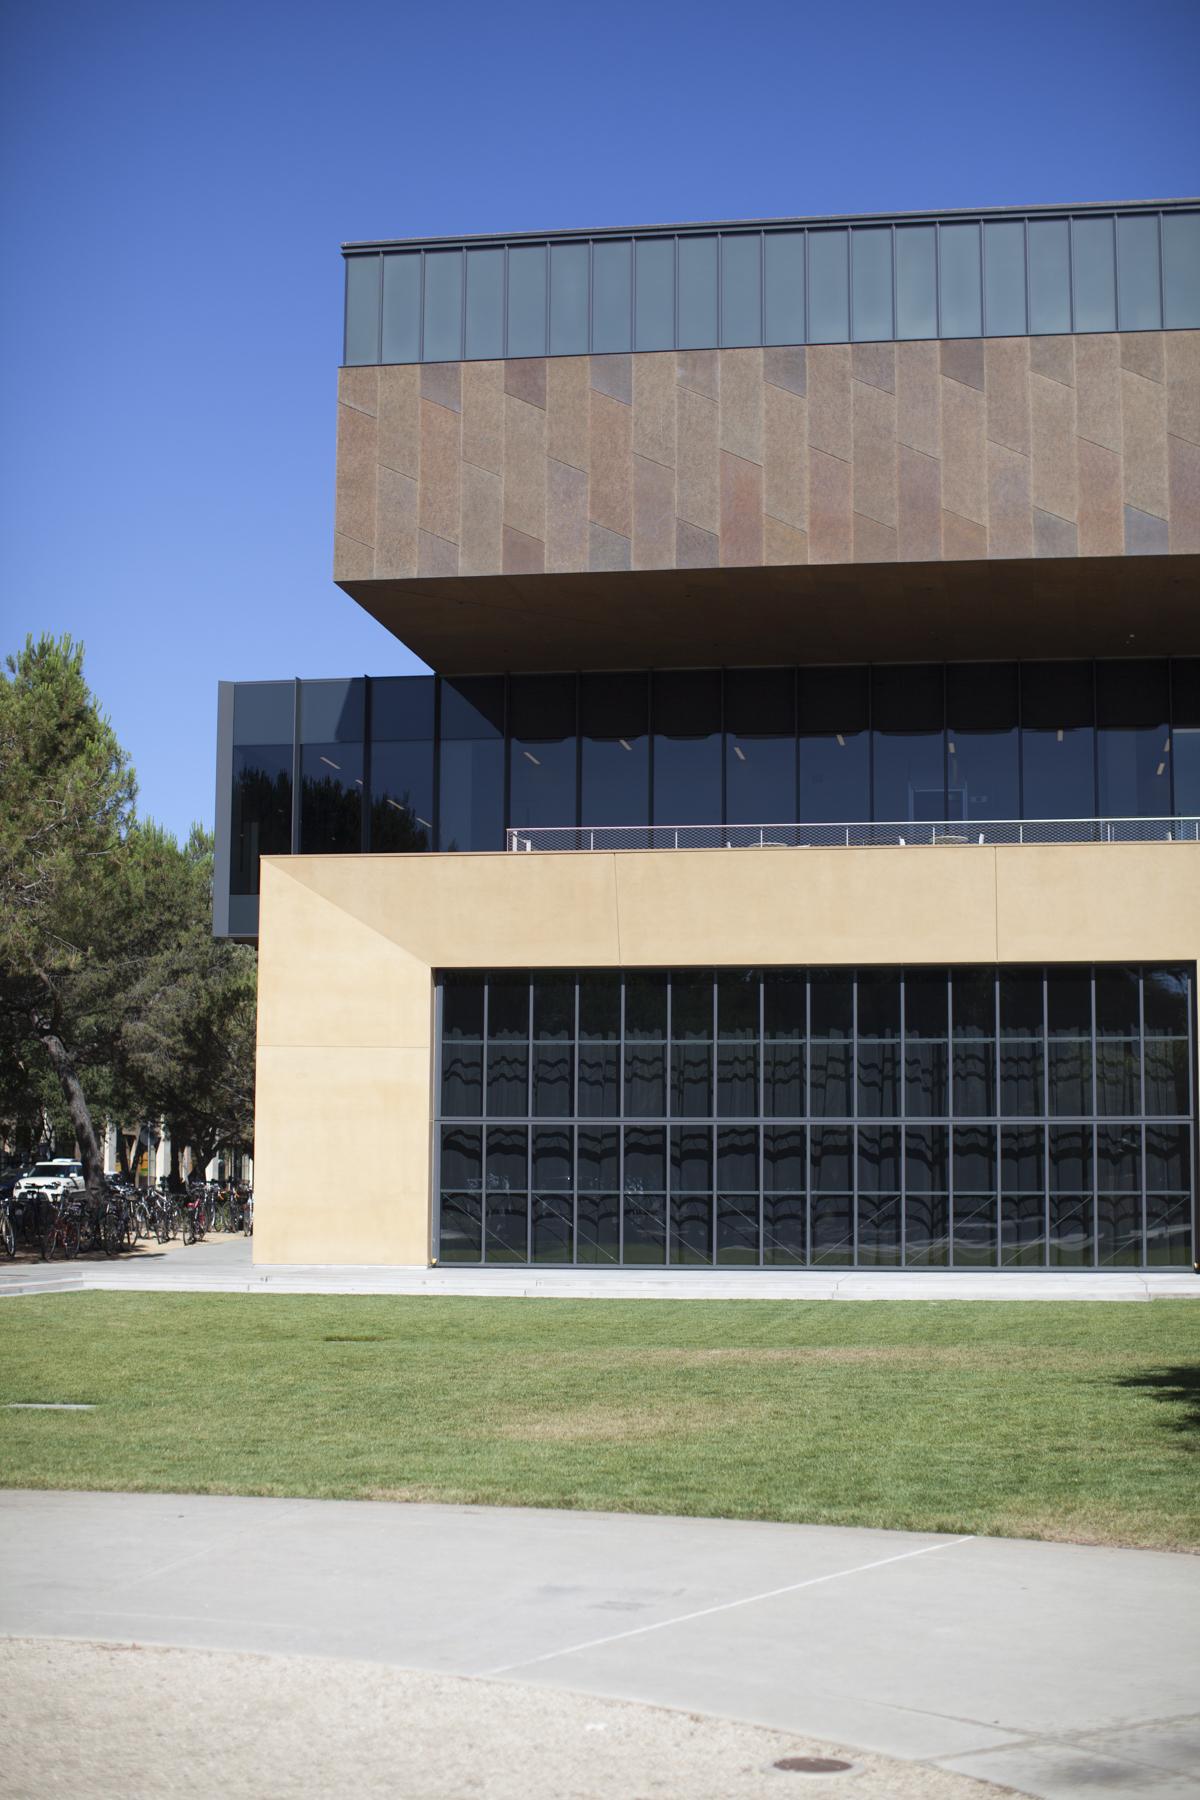 Stanford-IG-0075.jpg